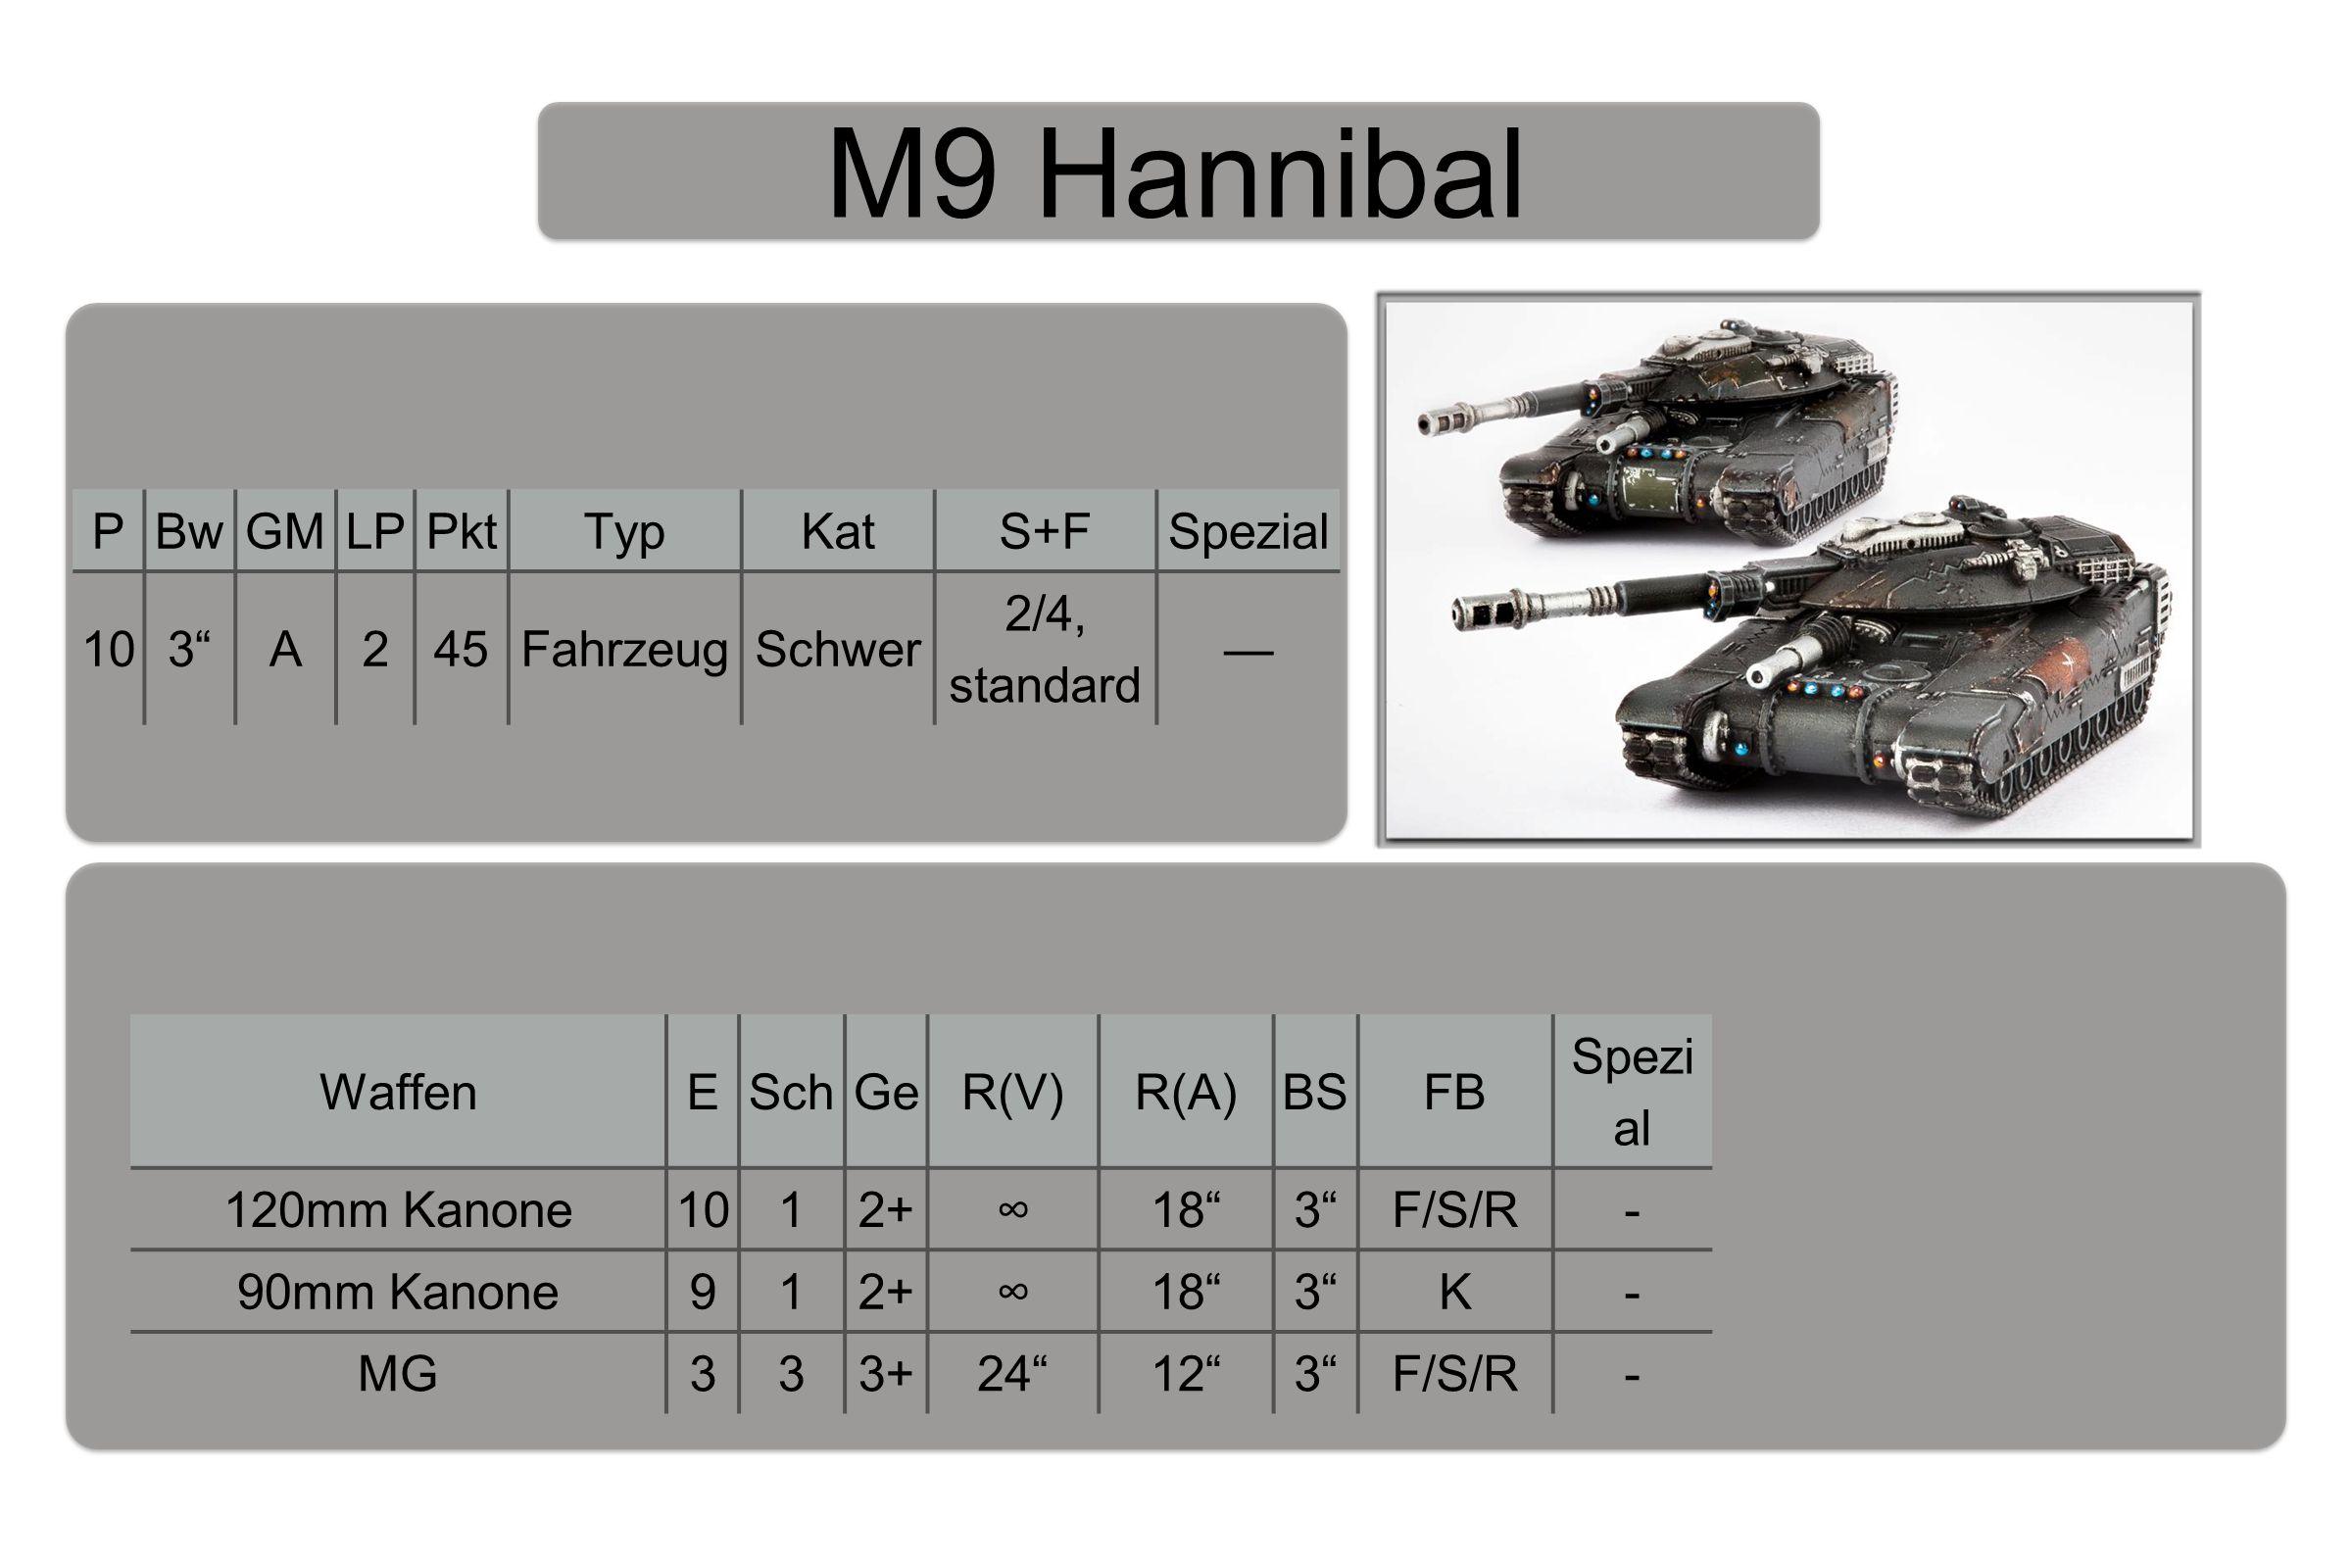 M9 Hannibal PBwGMLPPktTypKatS+FSpezial 103 A245FahrzeugSchwer 2/4, standard — WaffenESchGeR(V)R(A)BSFB Spezi al 120mm Kanone1012+∞18 3 F/S/R- 90mm Kanone912+∞18 3 K- MG333+24 12 3 F/S/R-